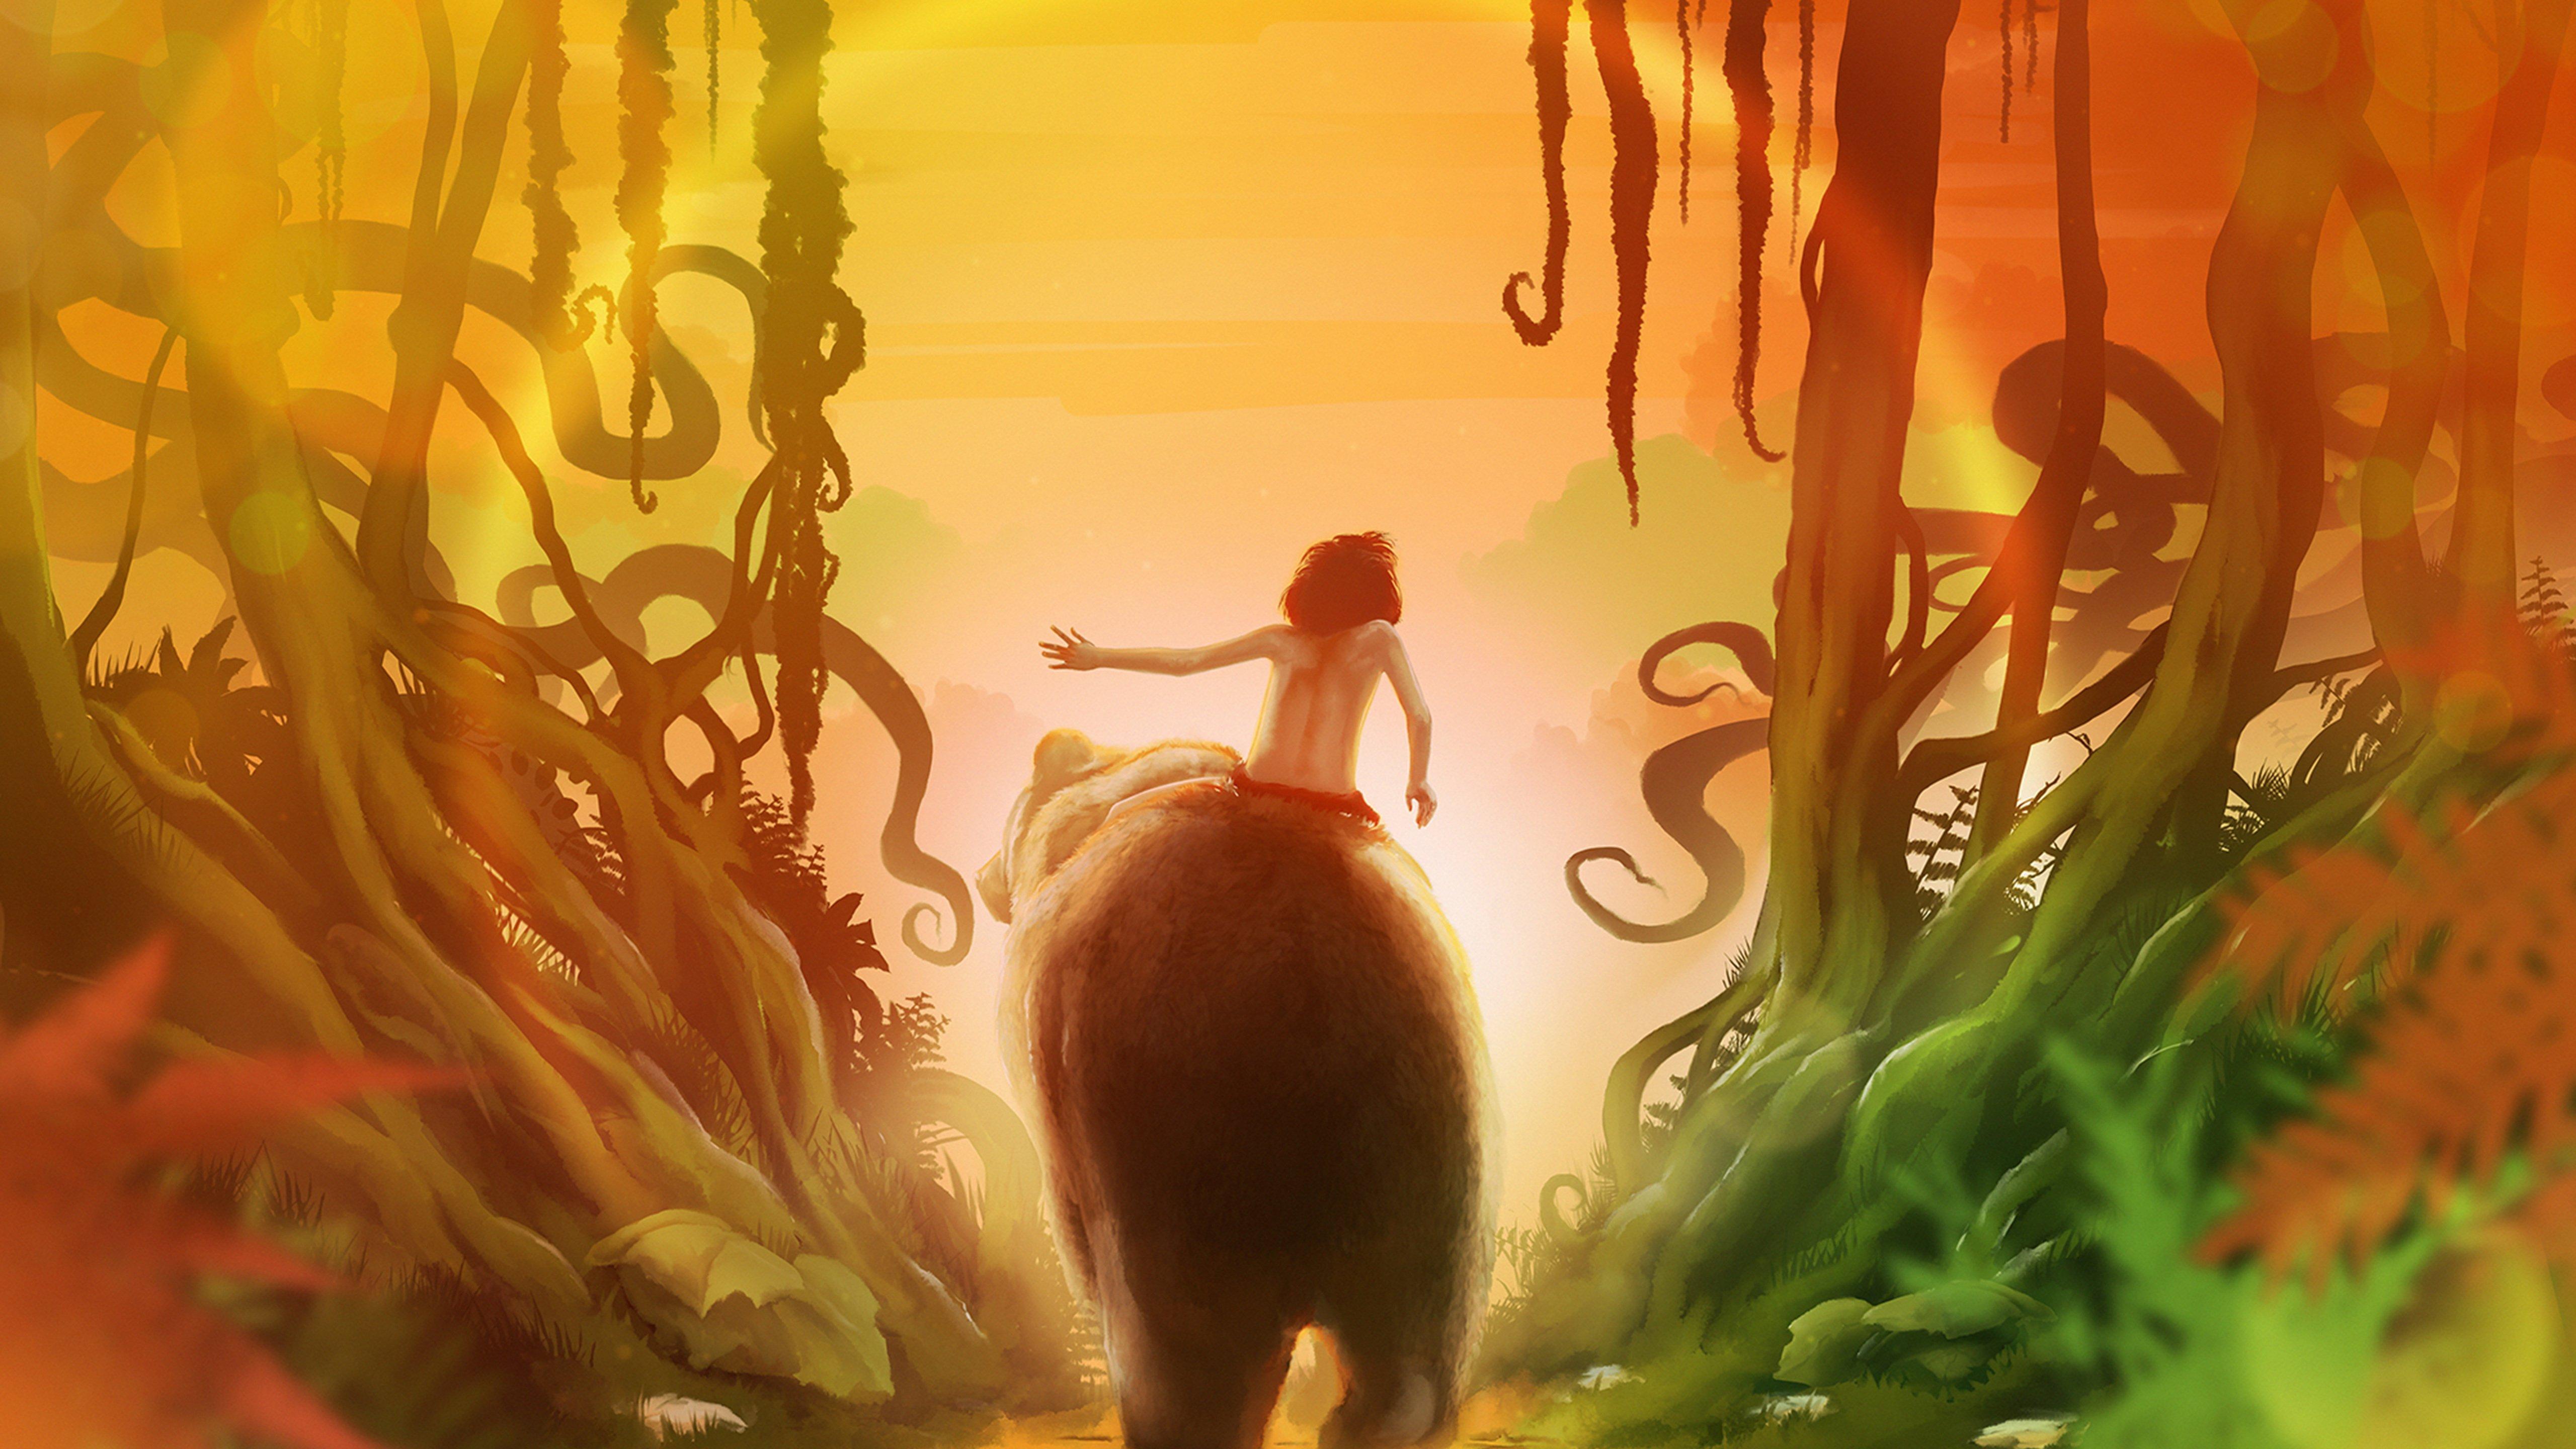 Fondos de pantalla El libro de la selva